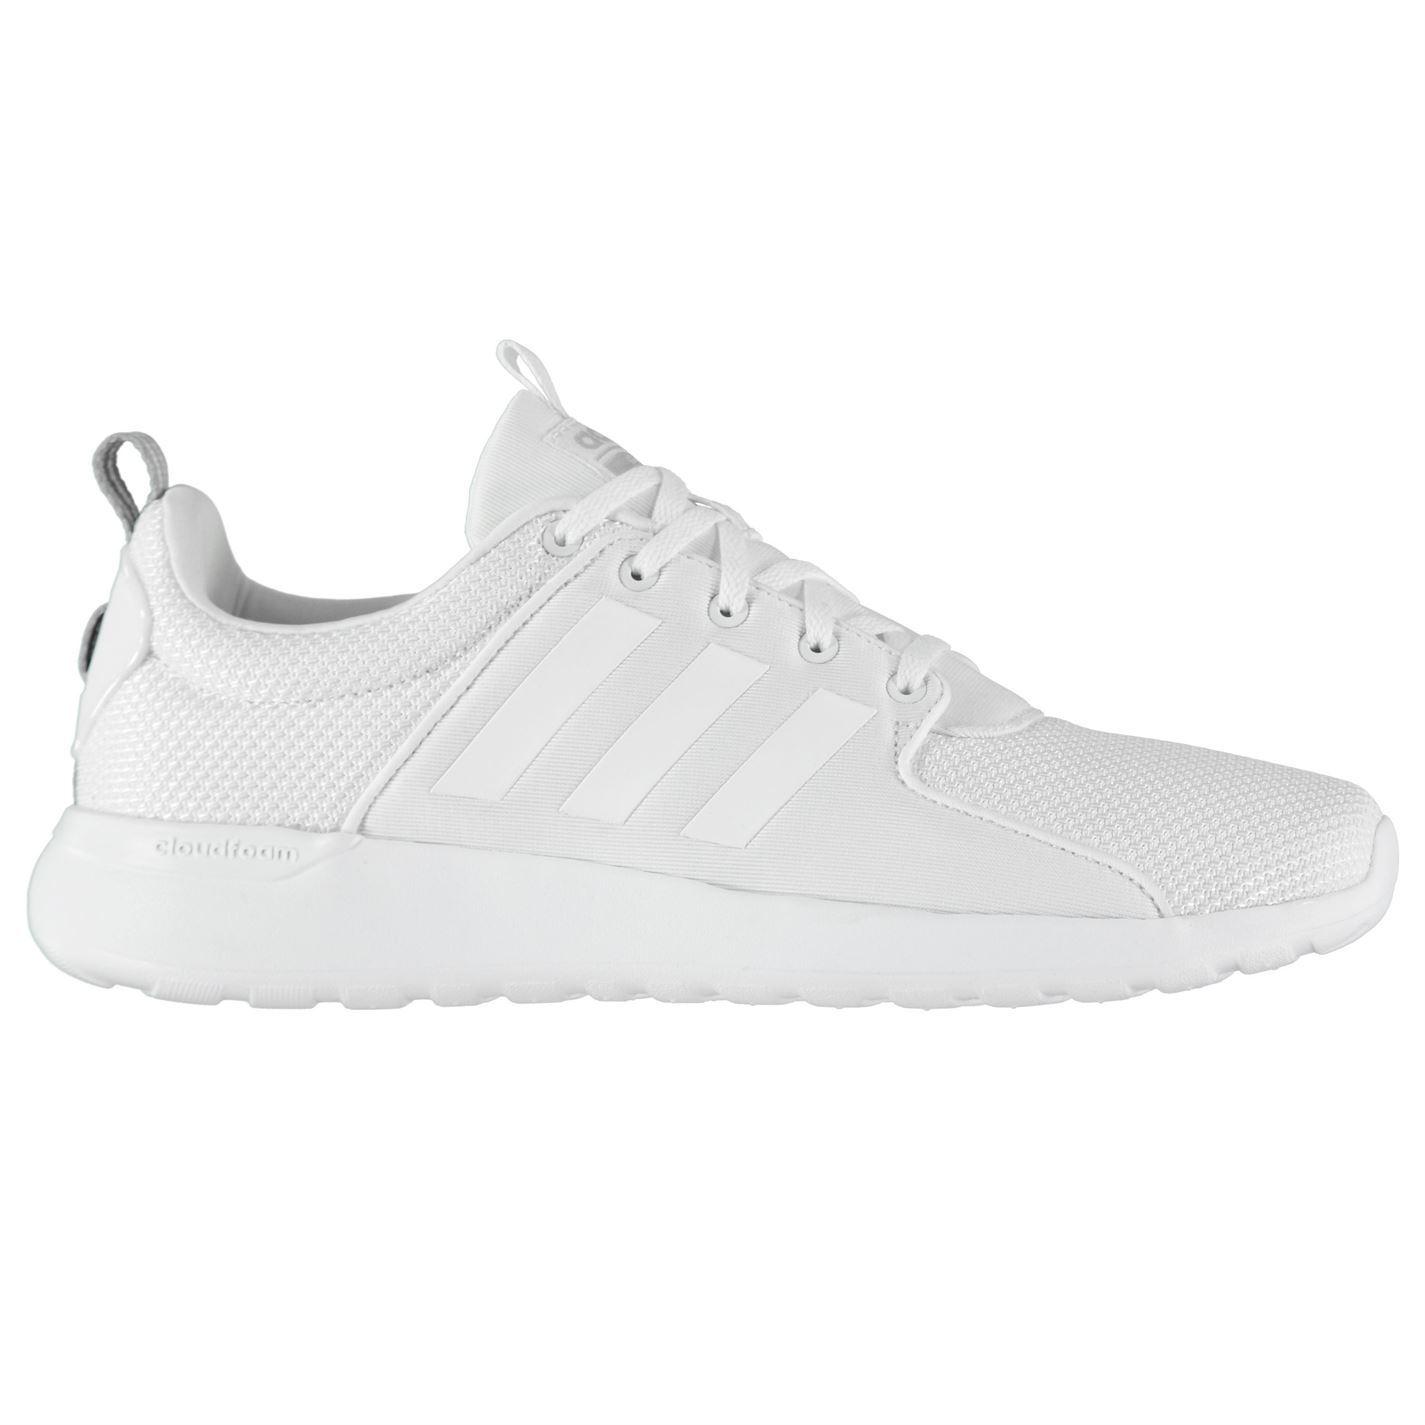 adidas cloudfoam white men 7acd16